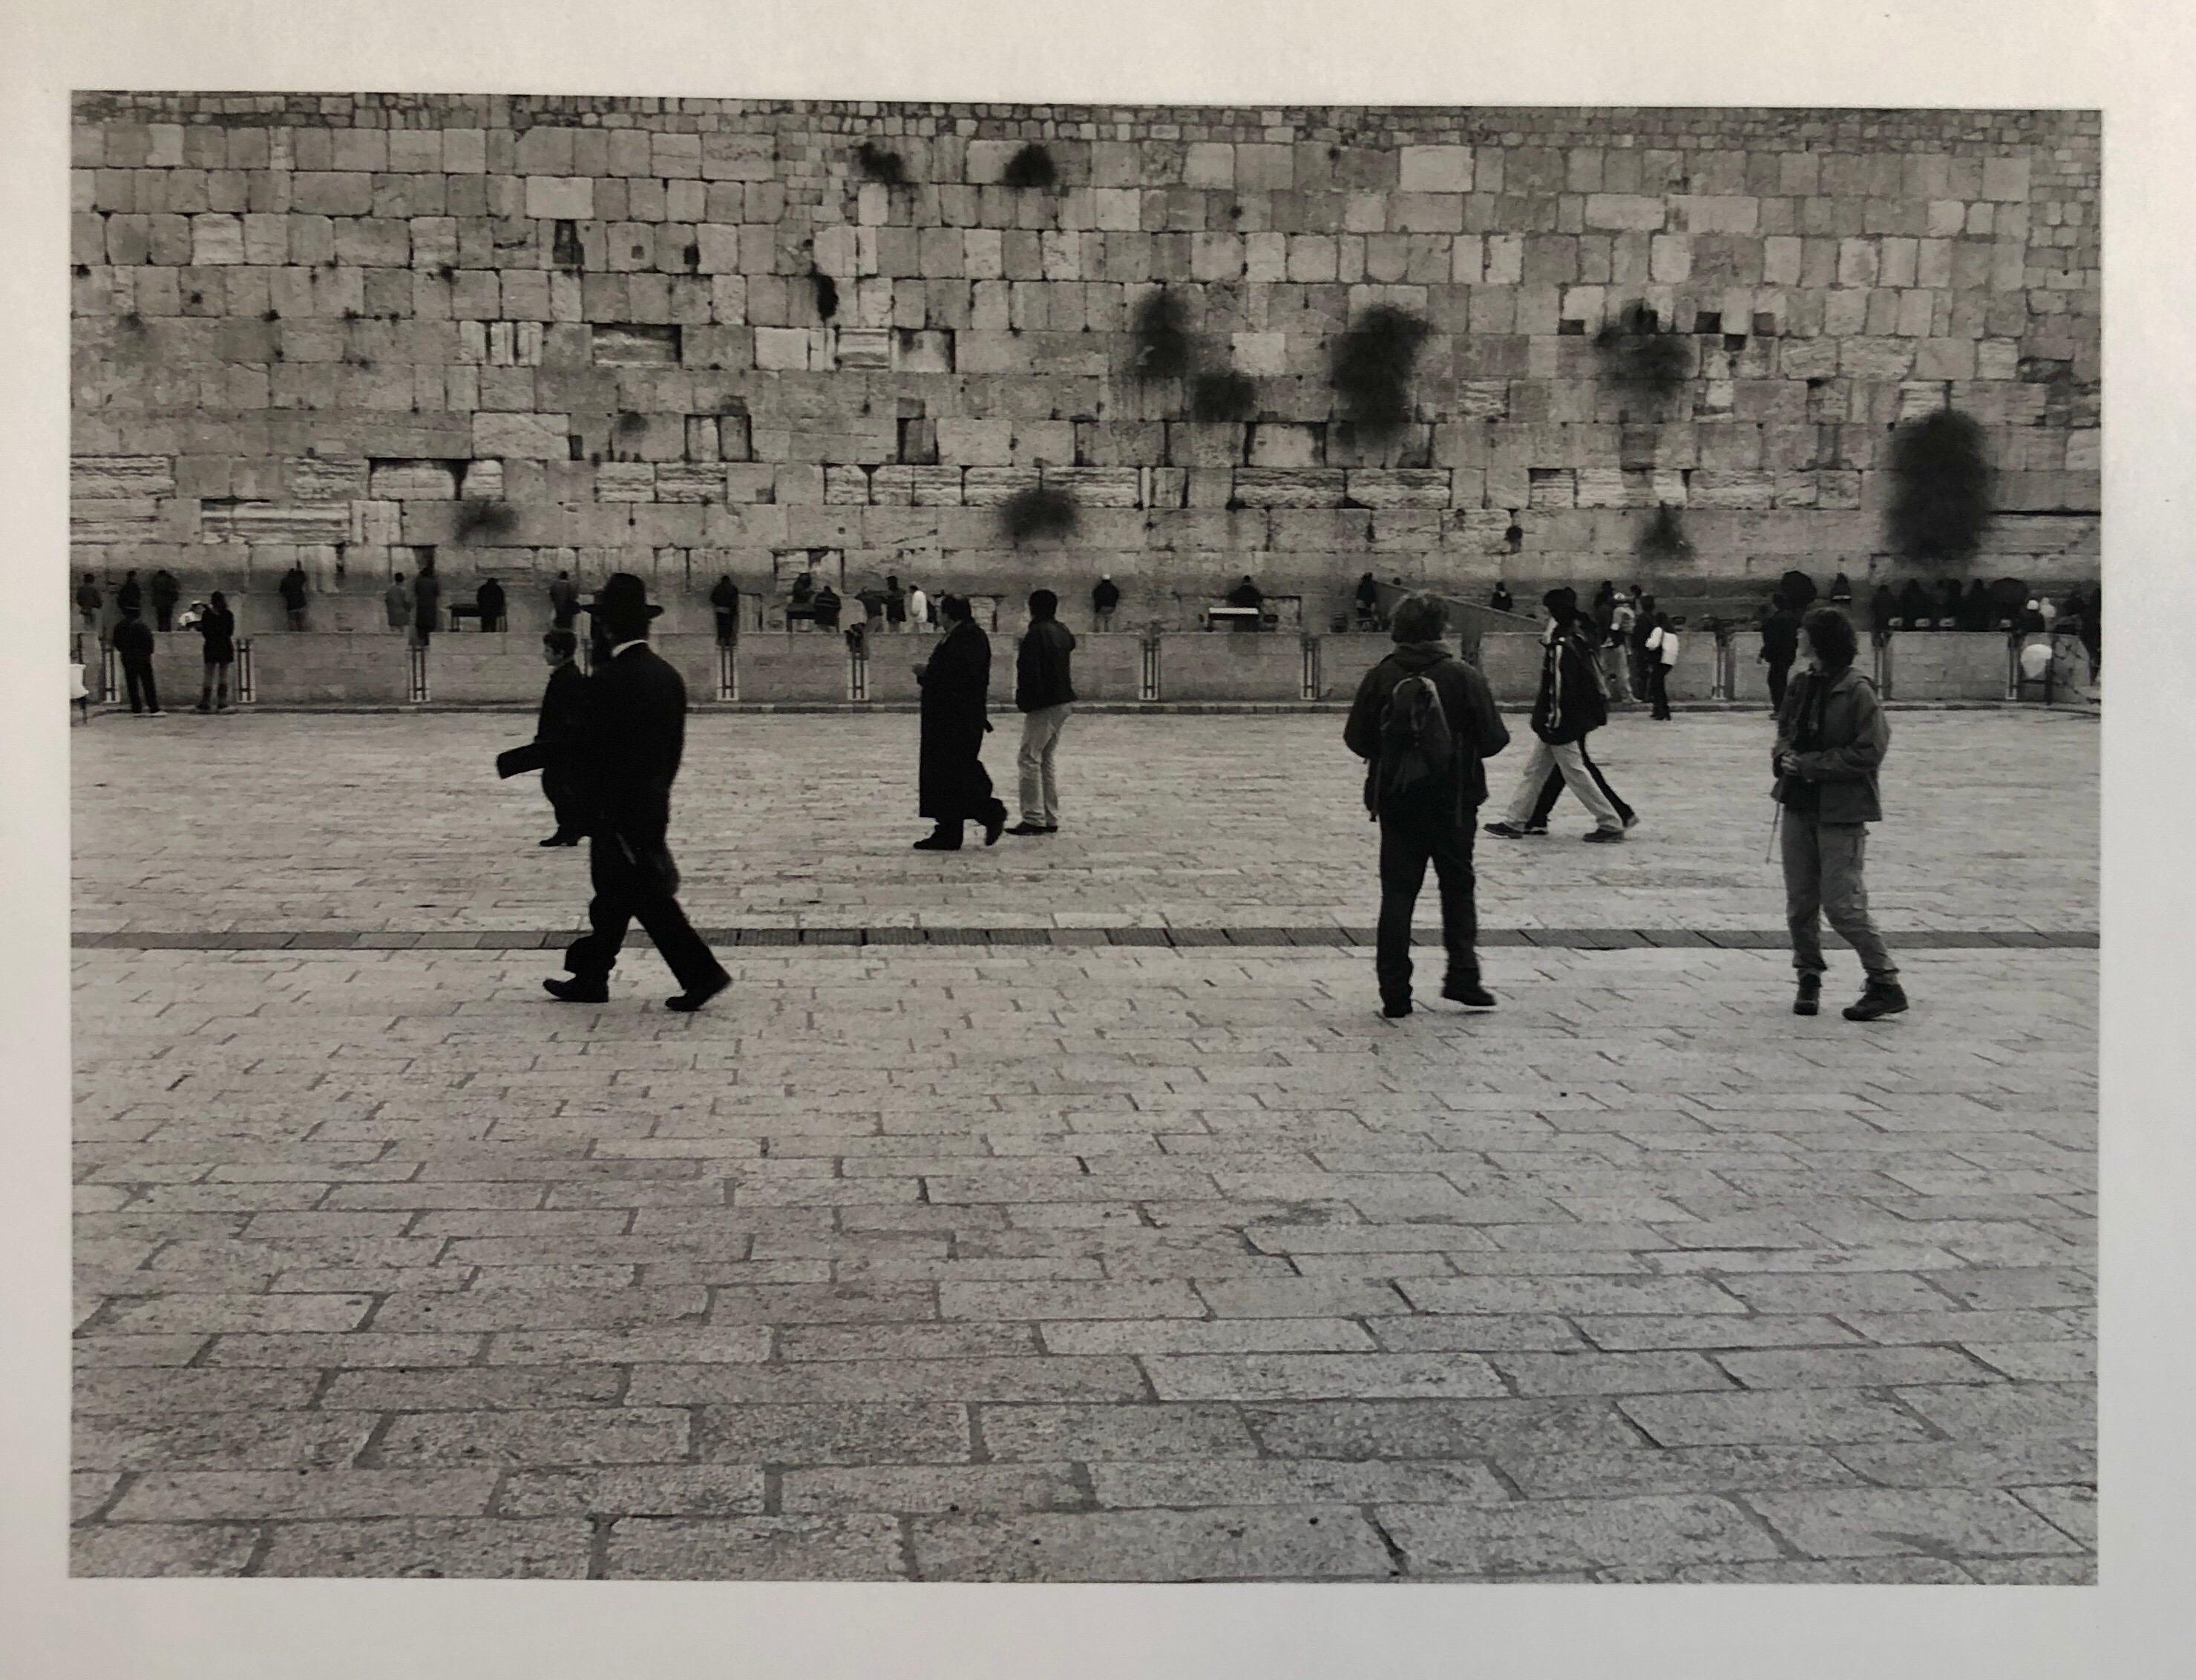 Jerusalem, Israel Western Wall Ed of 5 Vintage Silver gelatin Photograph Print